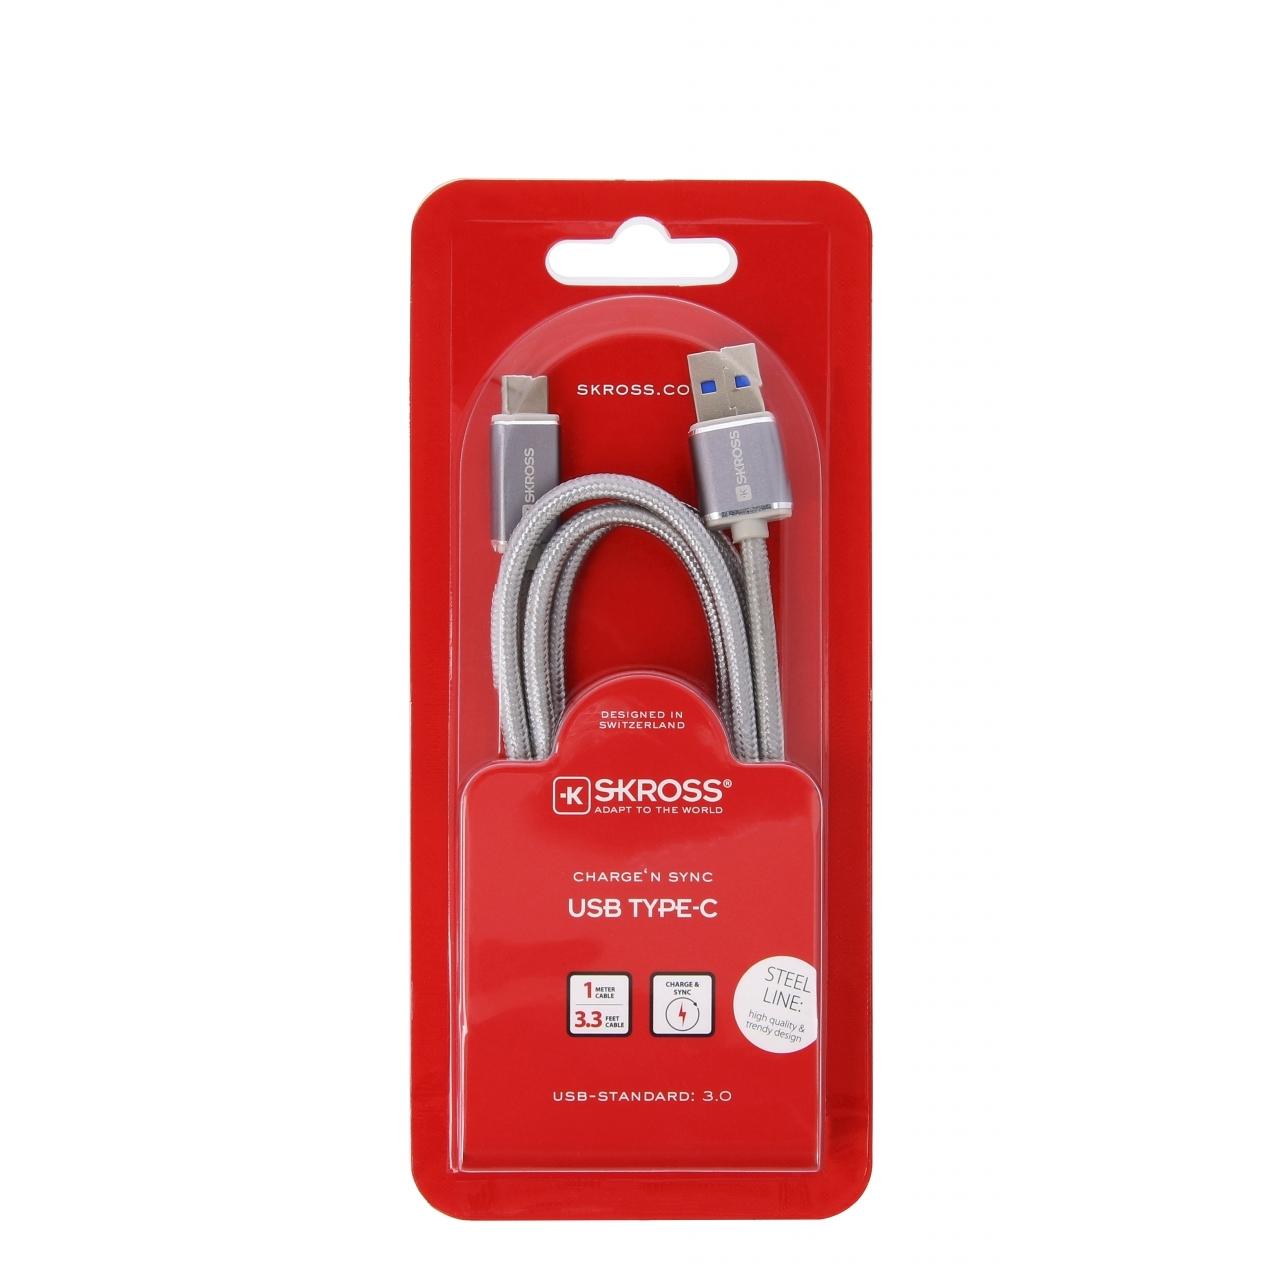 Kabel Skross Chargen Sync USB na USB Typ C